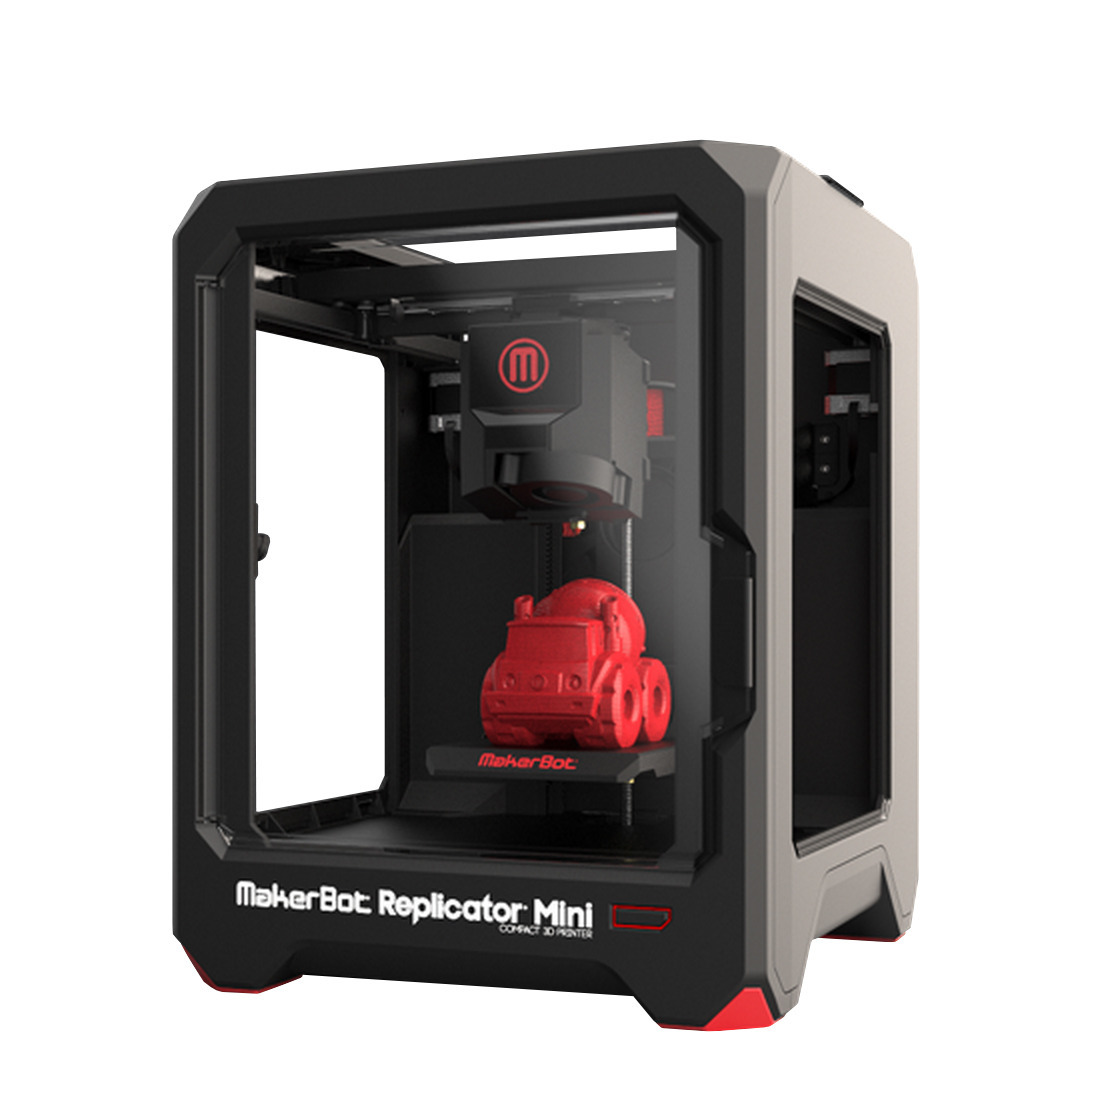 MakerBot Replicator 3D Printer USB Driver PC